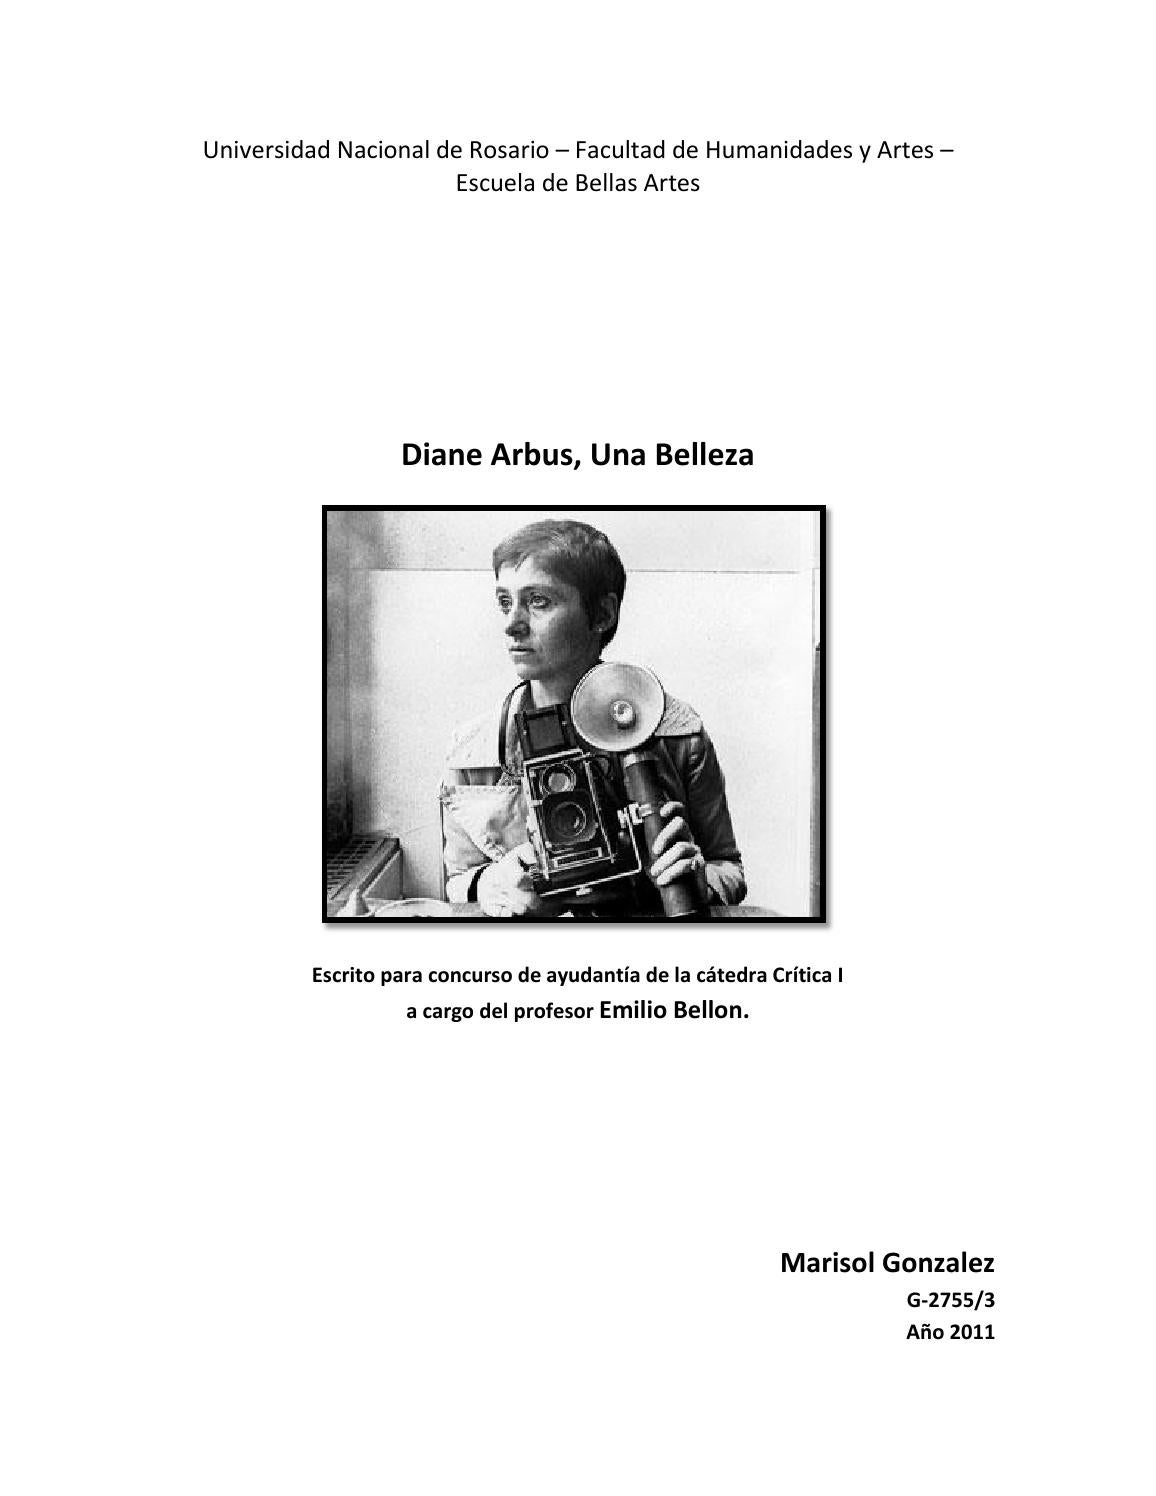 Diane arbus, una belleza by Marisol Gonzalez - issuu